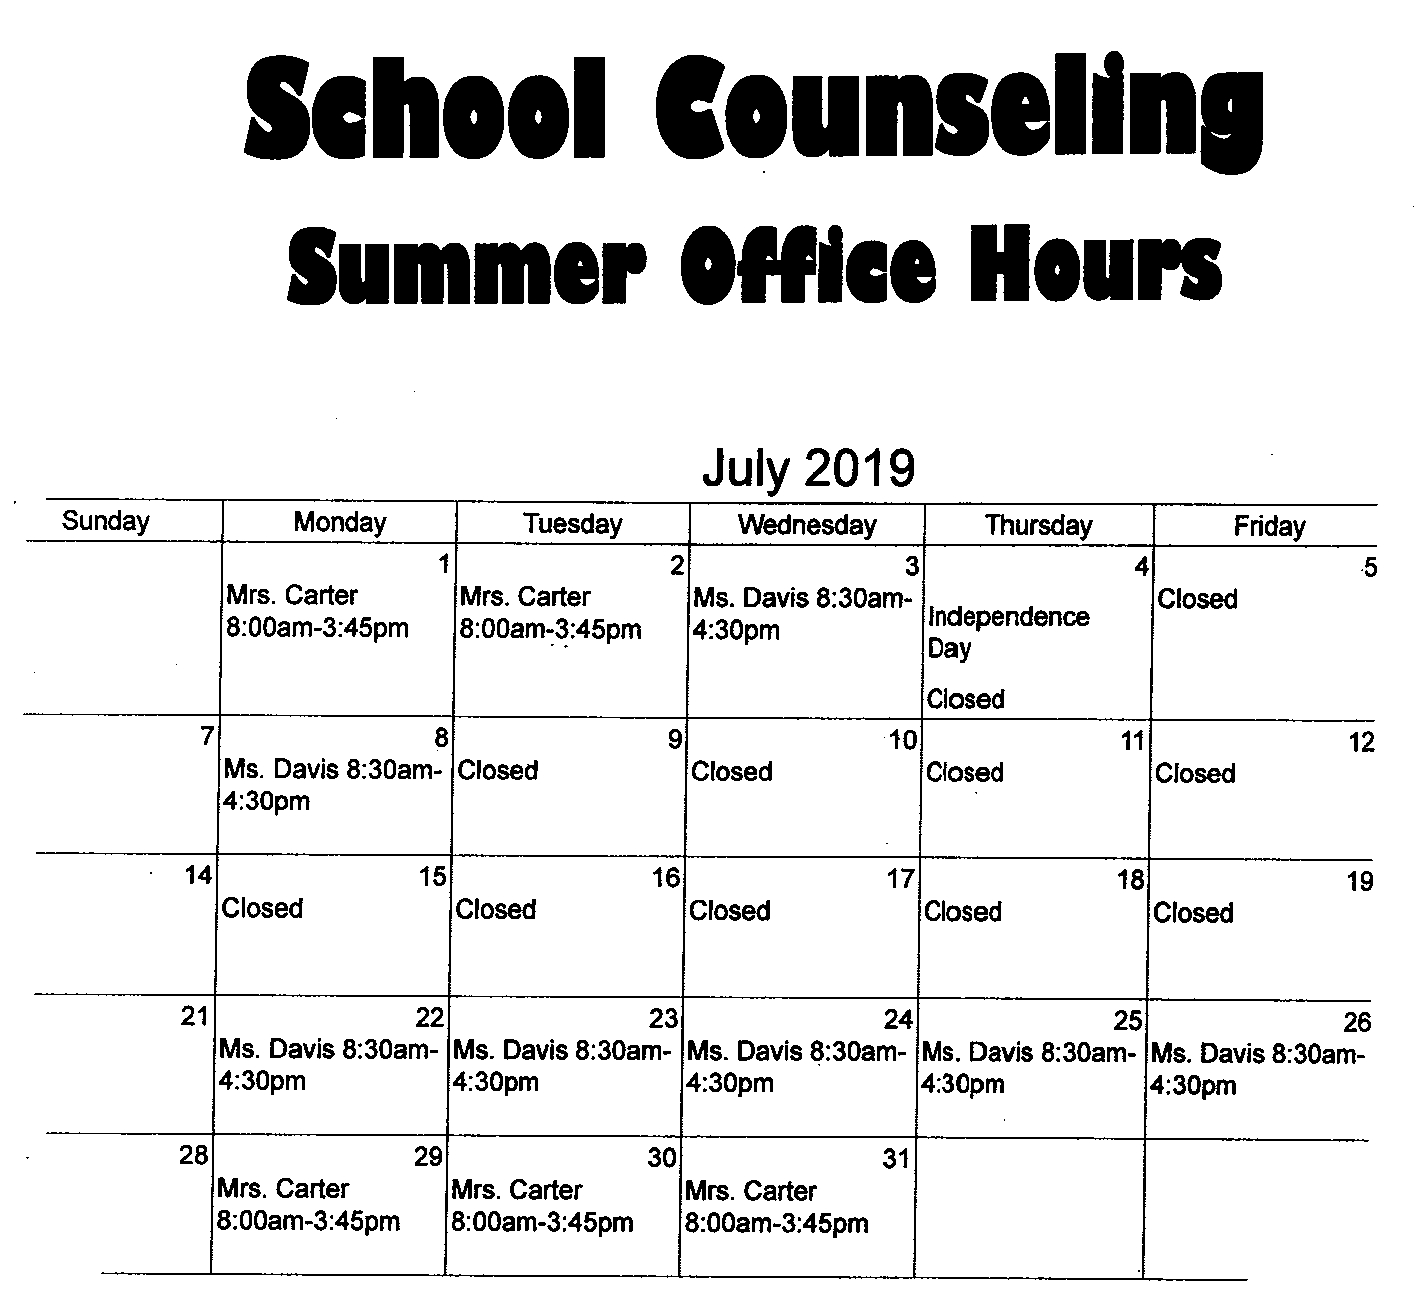 Year Round Calendar Abss | Month Calendar Printable With Regard To Example Year Round School Schedule